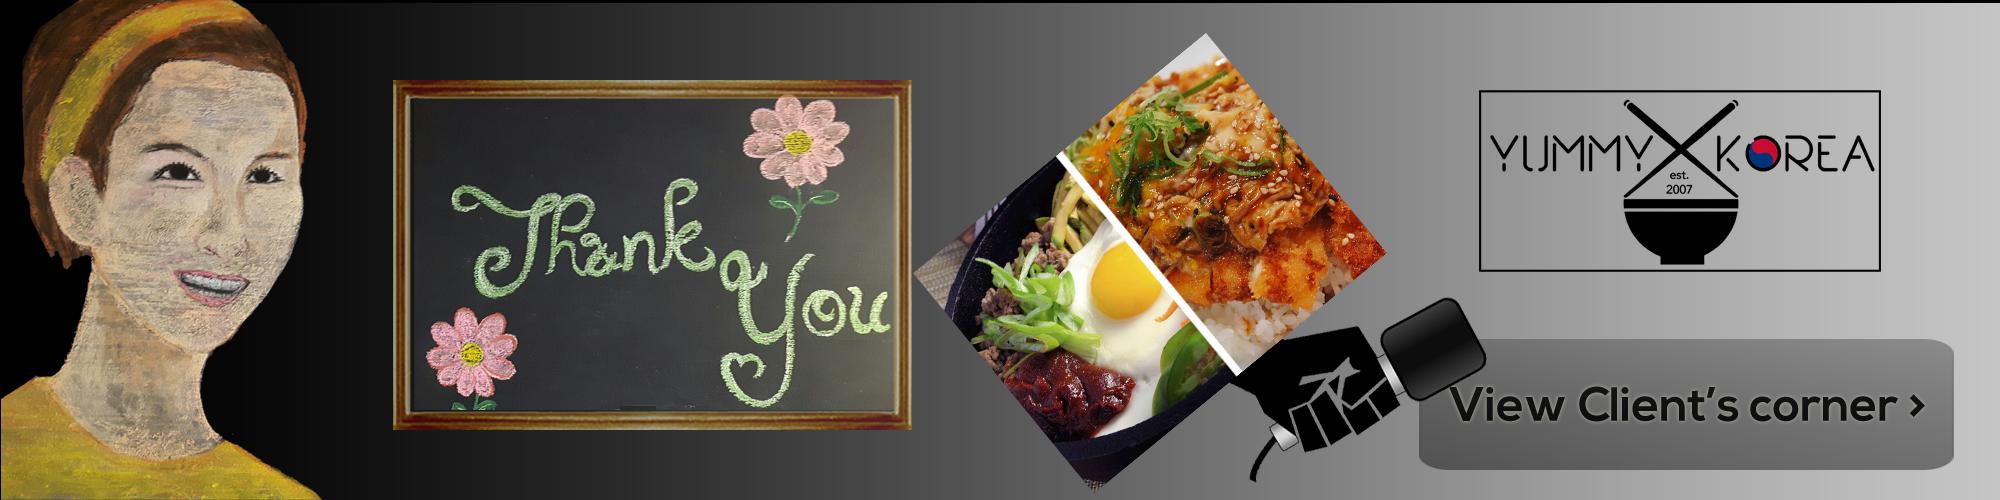 Yummy Korea Client's Corner Listing Banner